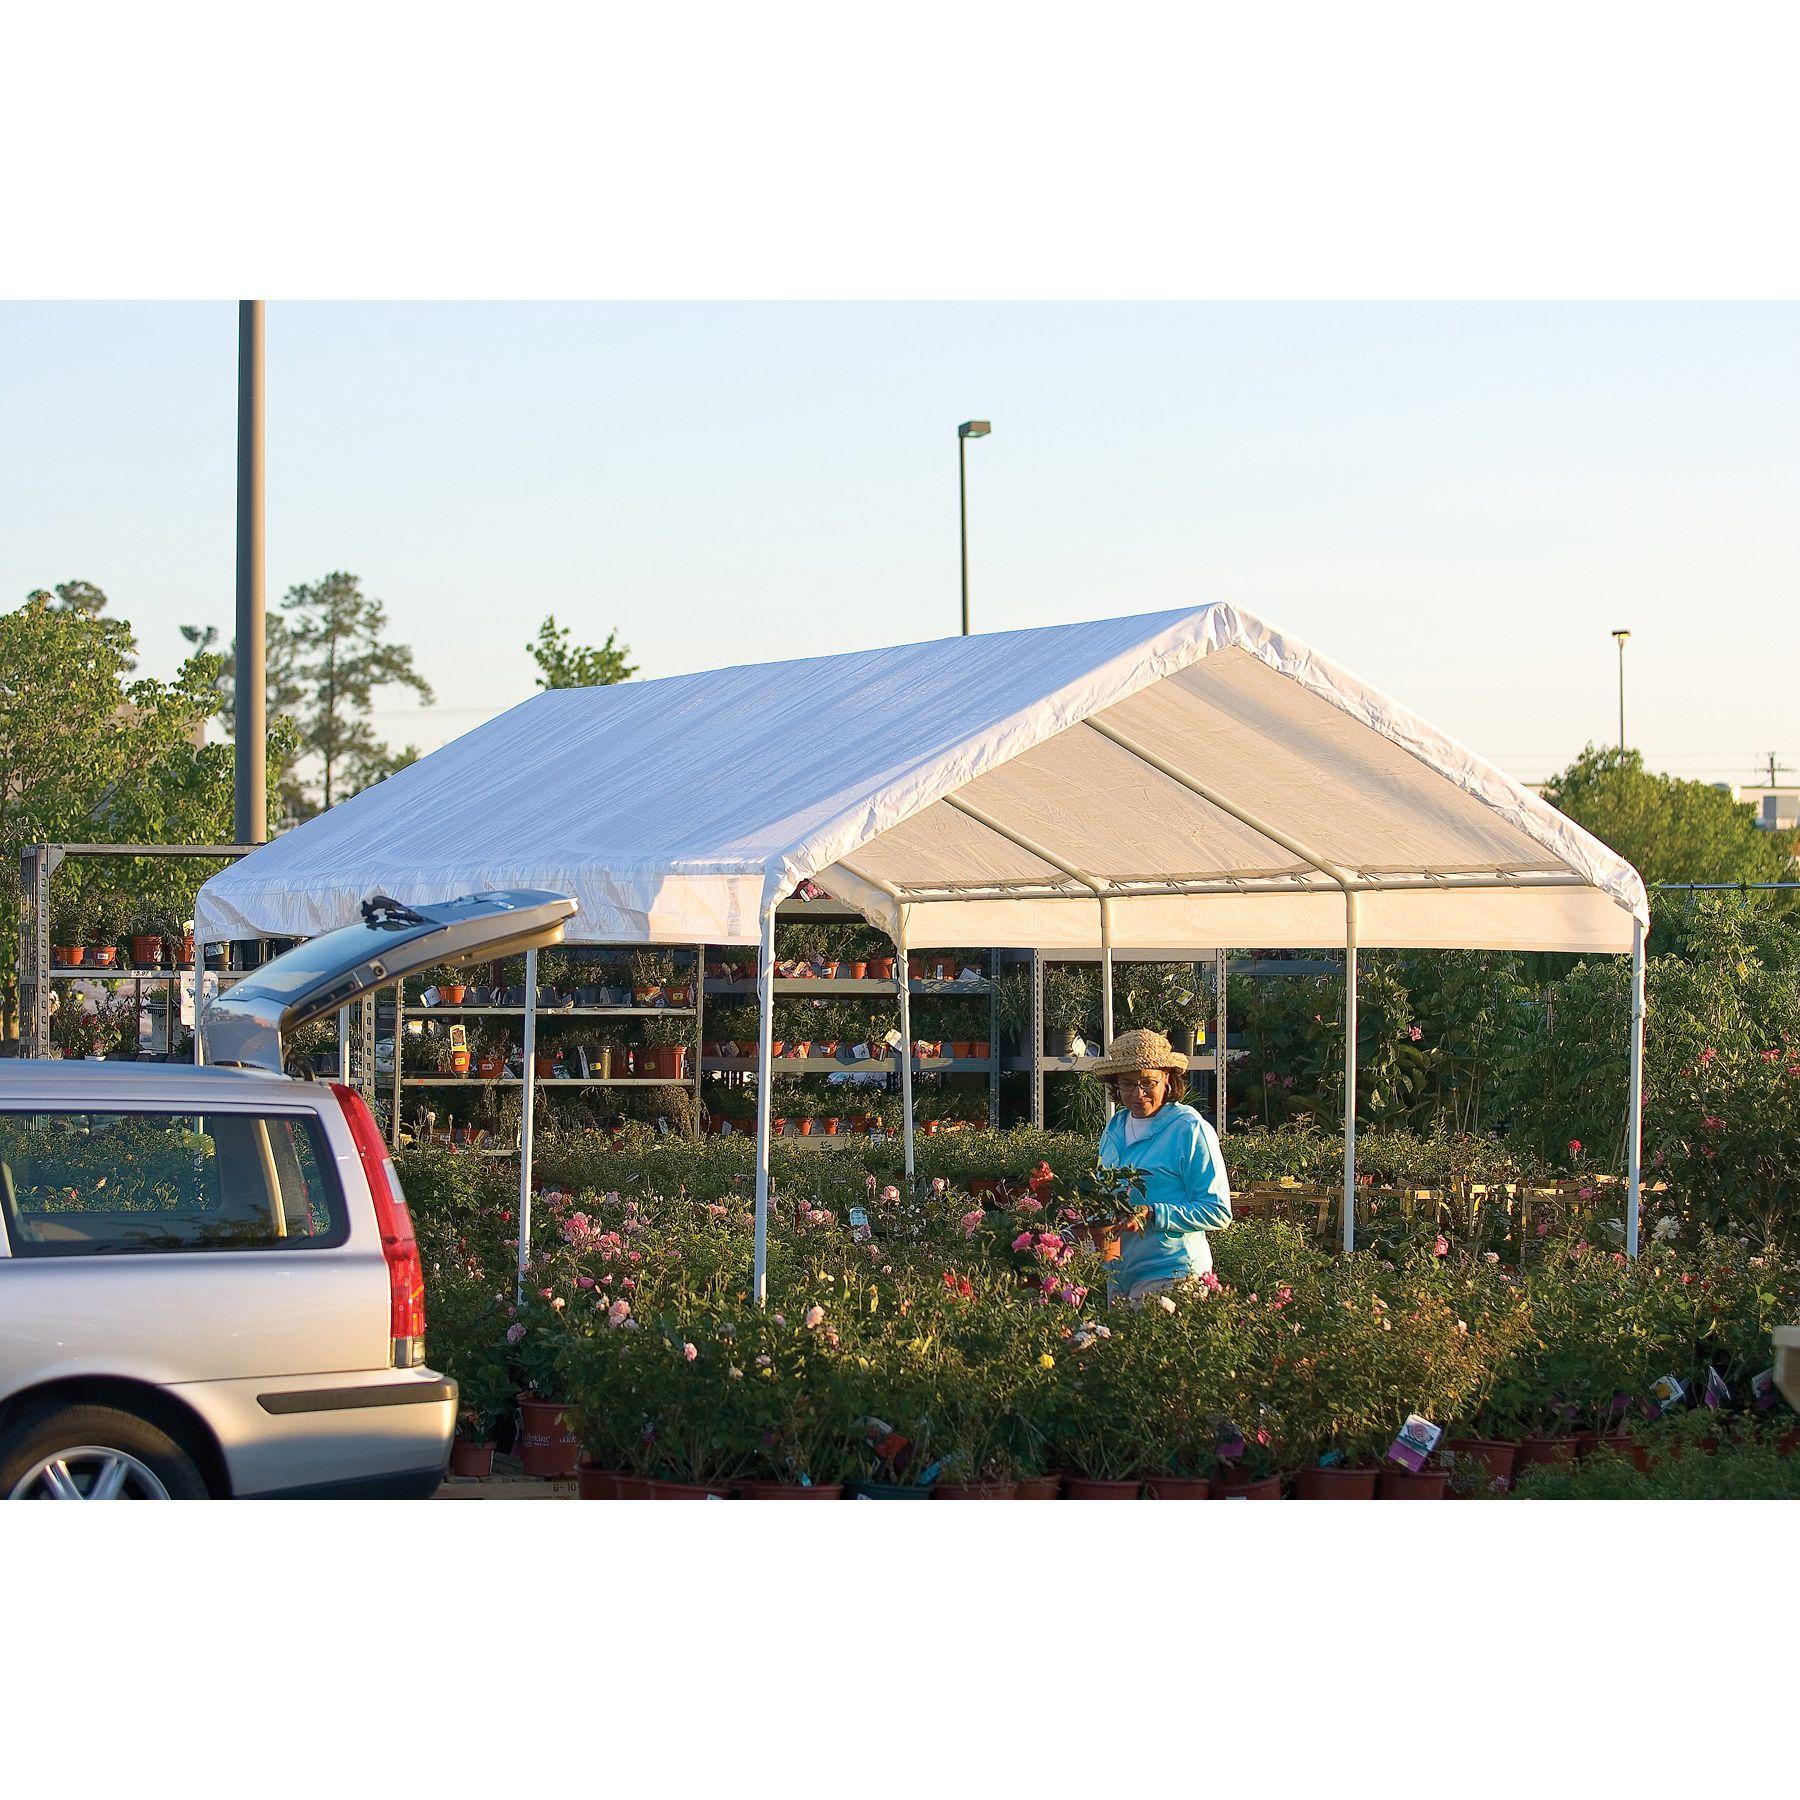 Shelterlogic 10x20 - 8 Leg Purpose Canopy White